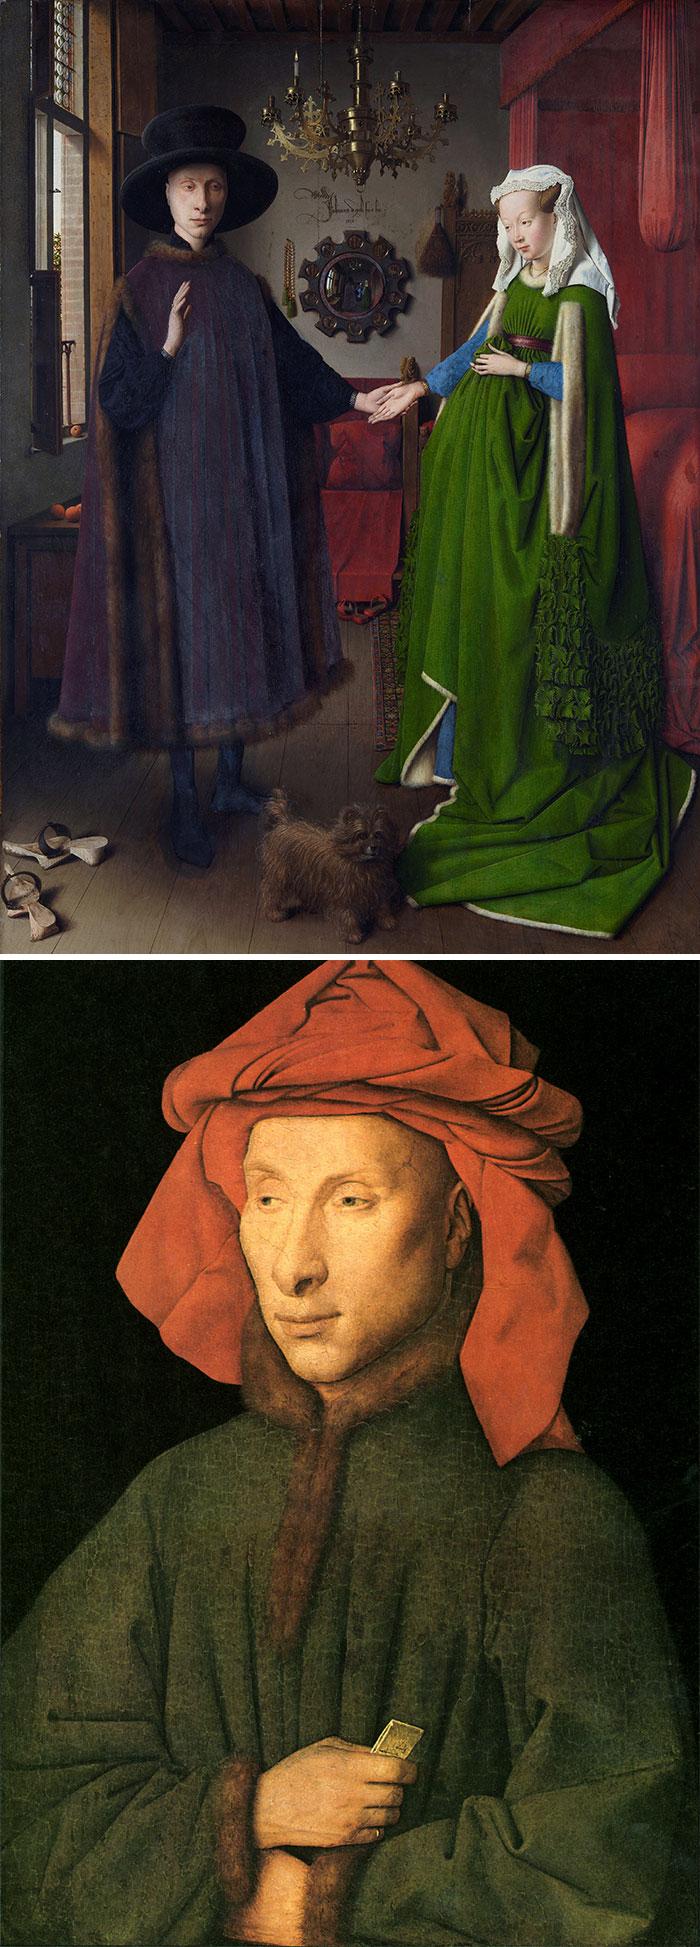 If Everyone – Including The Women – Looks Like Putin, Then It's Van Eyck